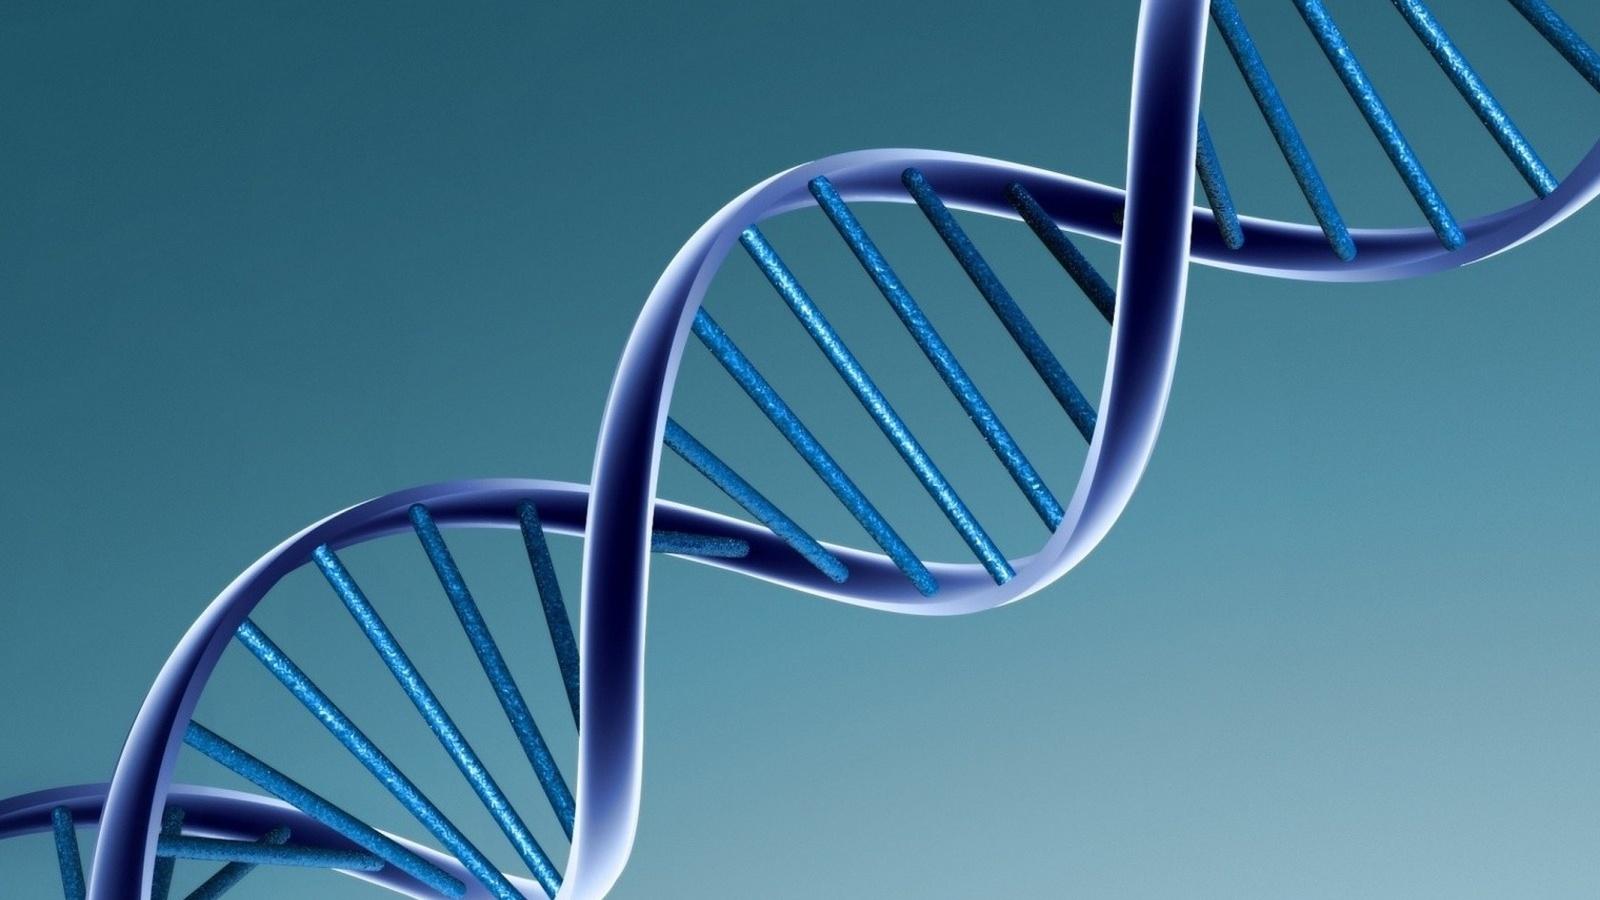 DNA Helix Wallpaper Pictures 6 Dna Helix Wallpaper Biological 1600x900